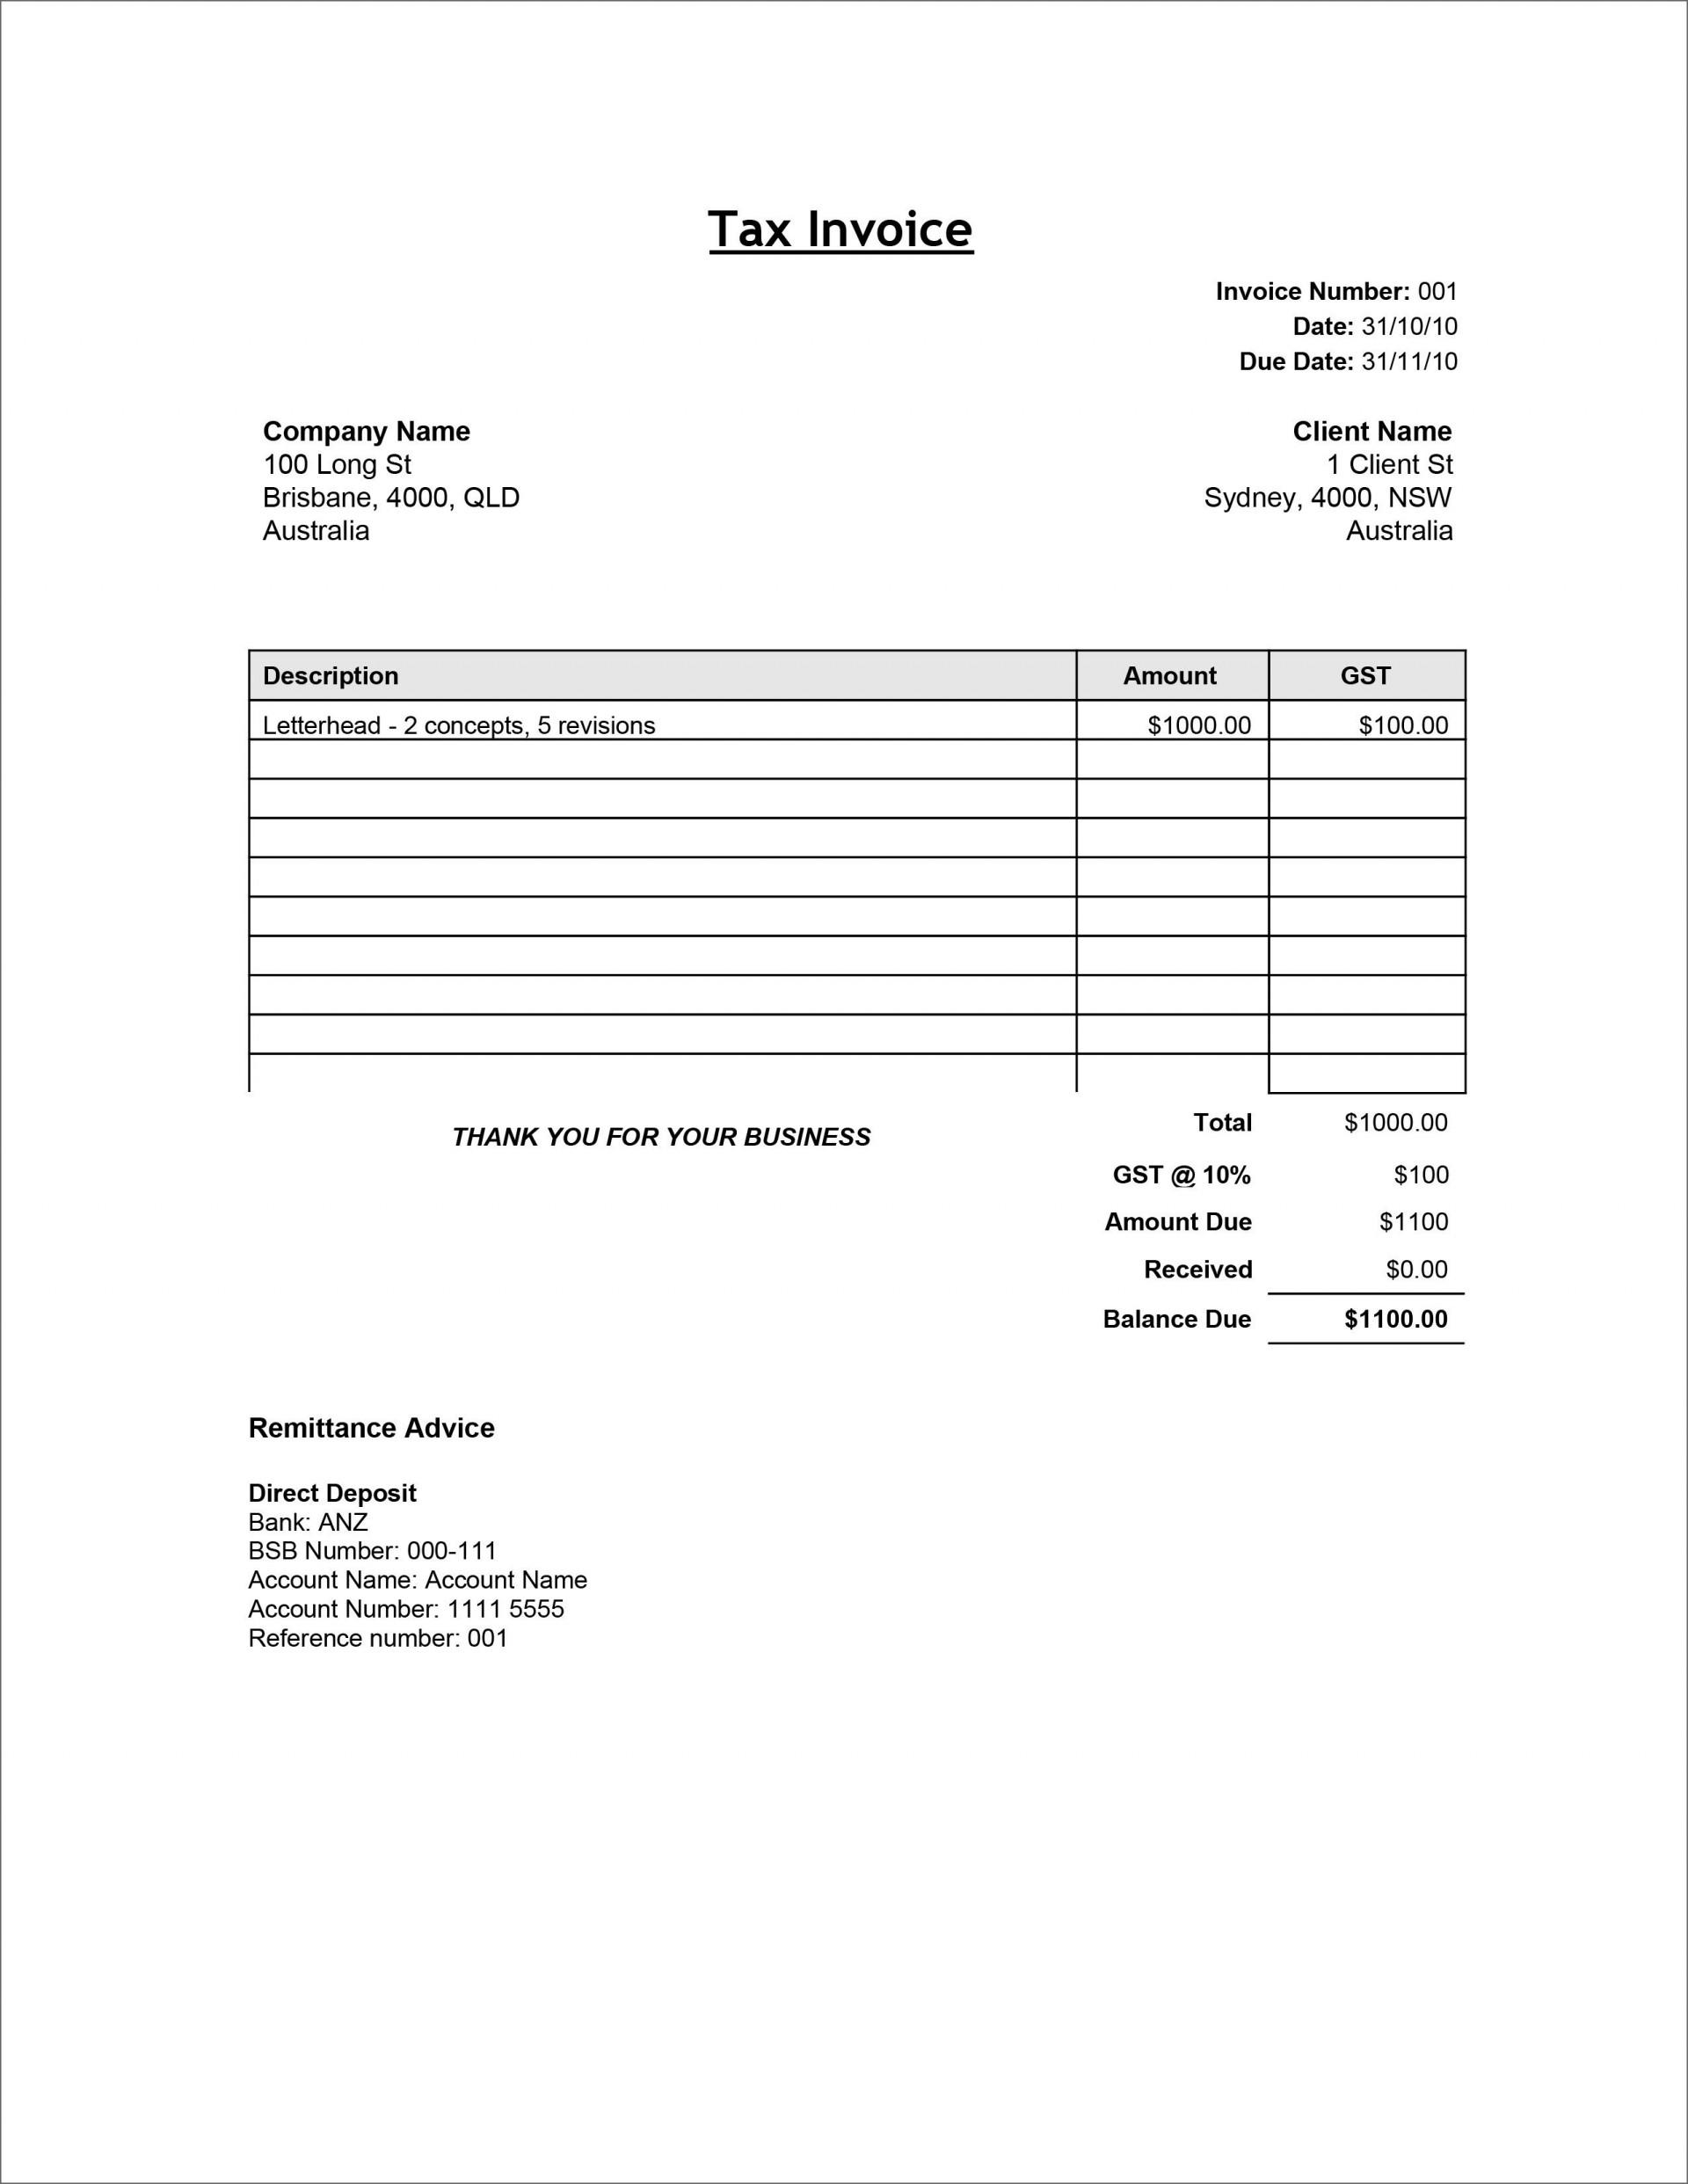 008 Awful Free Printable Tax Invoice Template Australia Example 1920